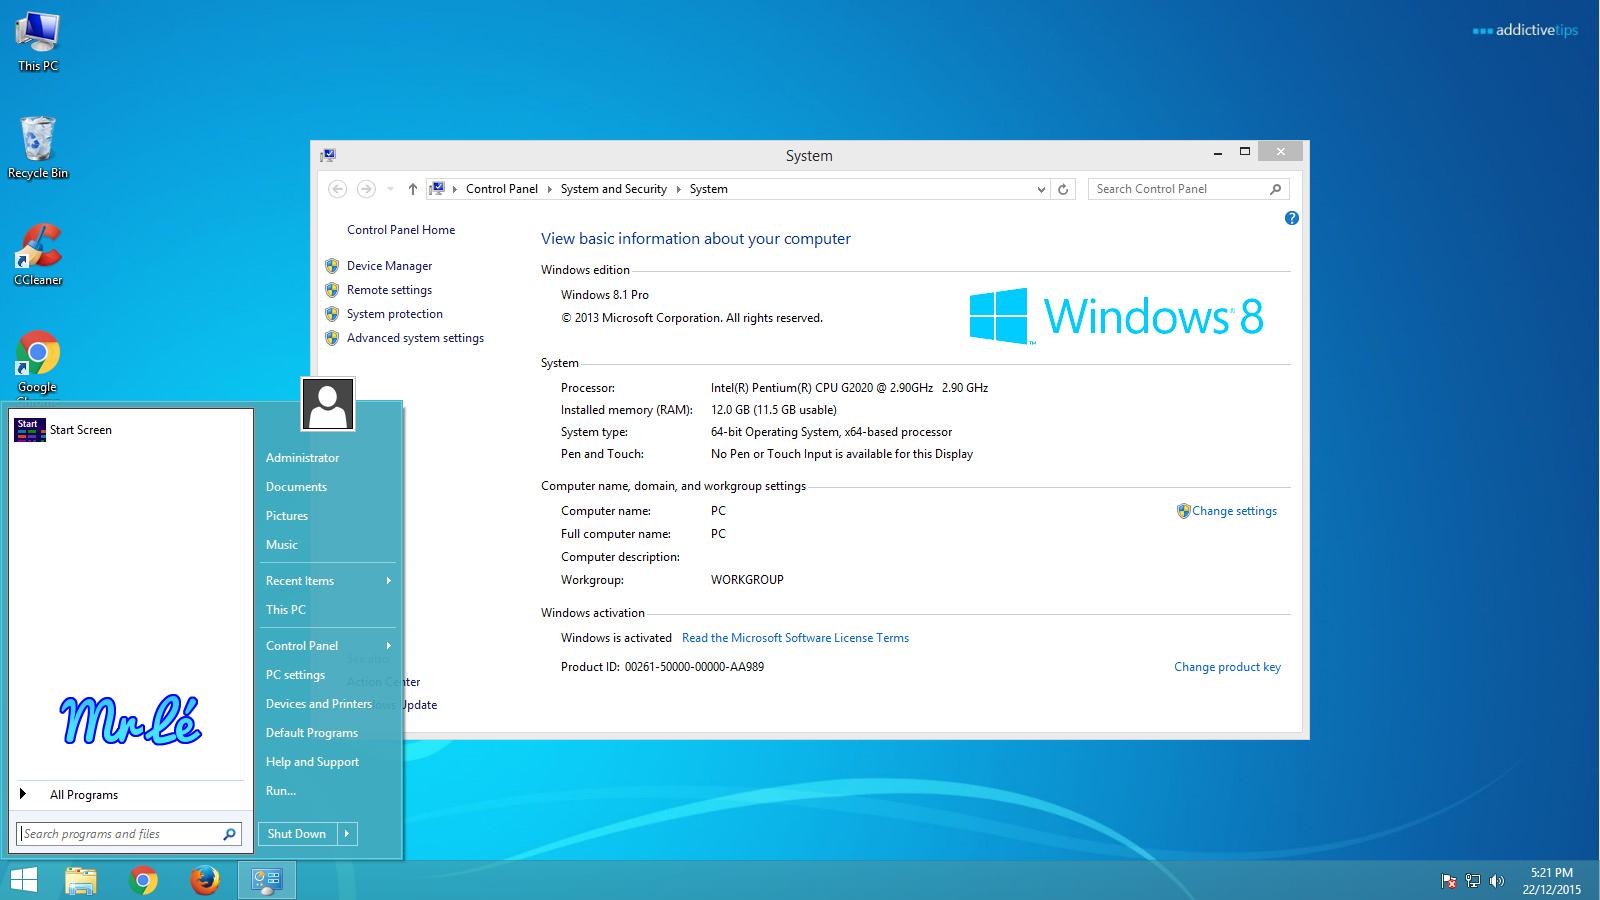 windows 7 professional download 64 bit